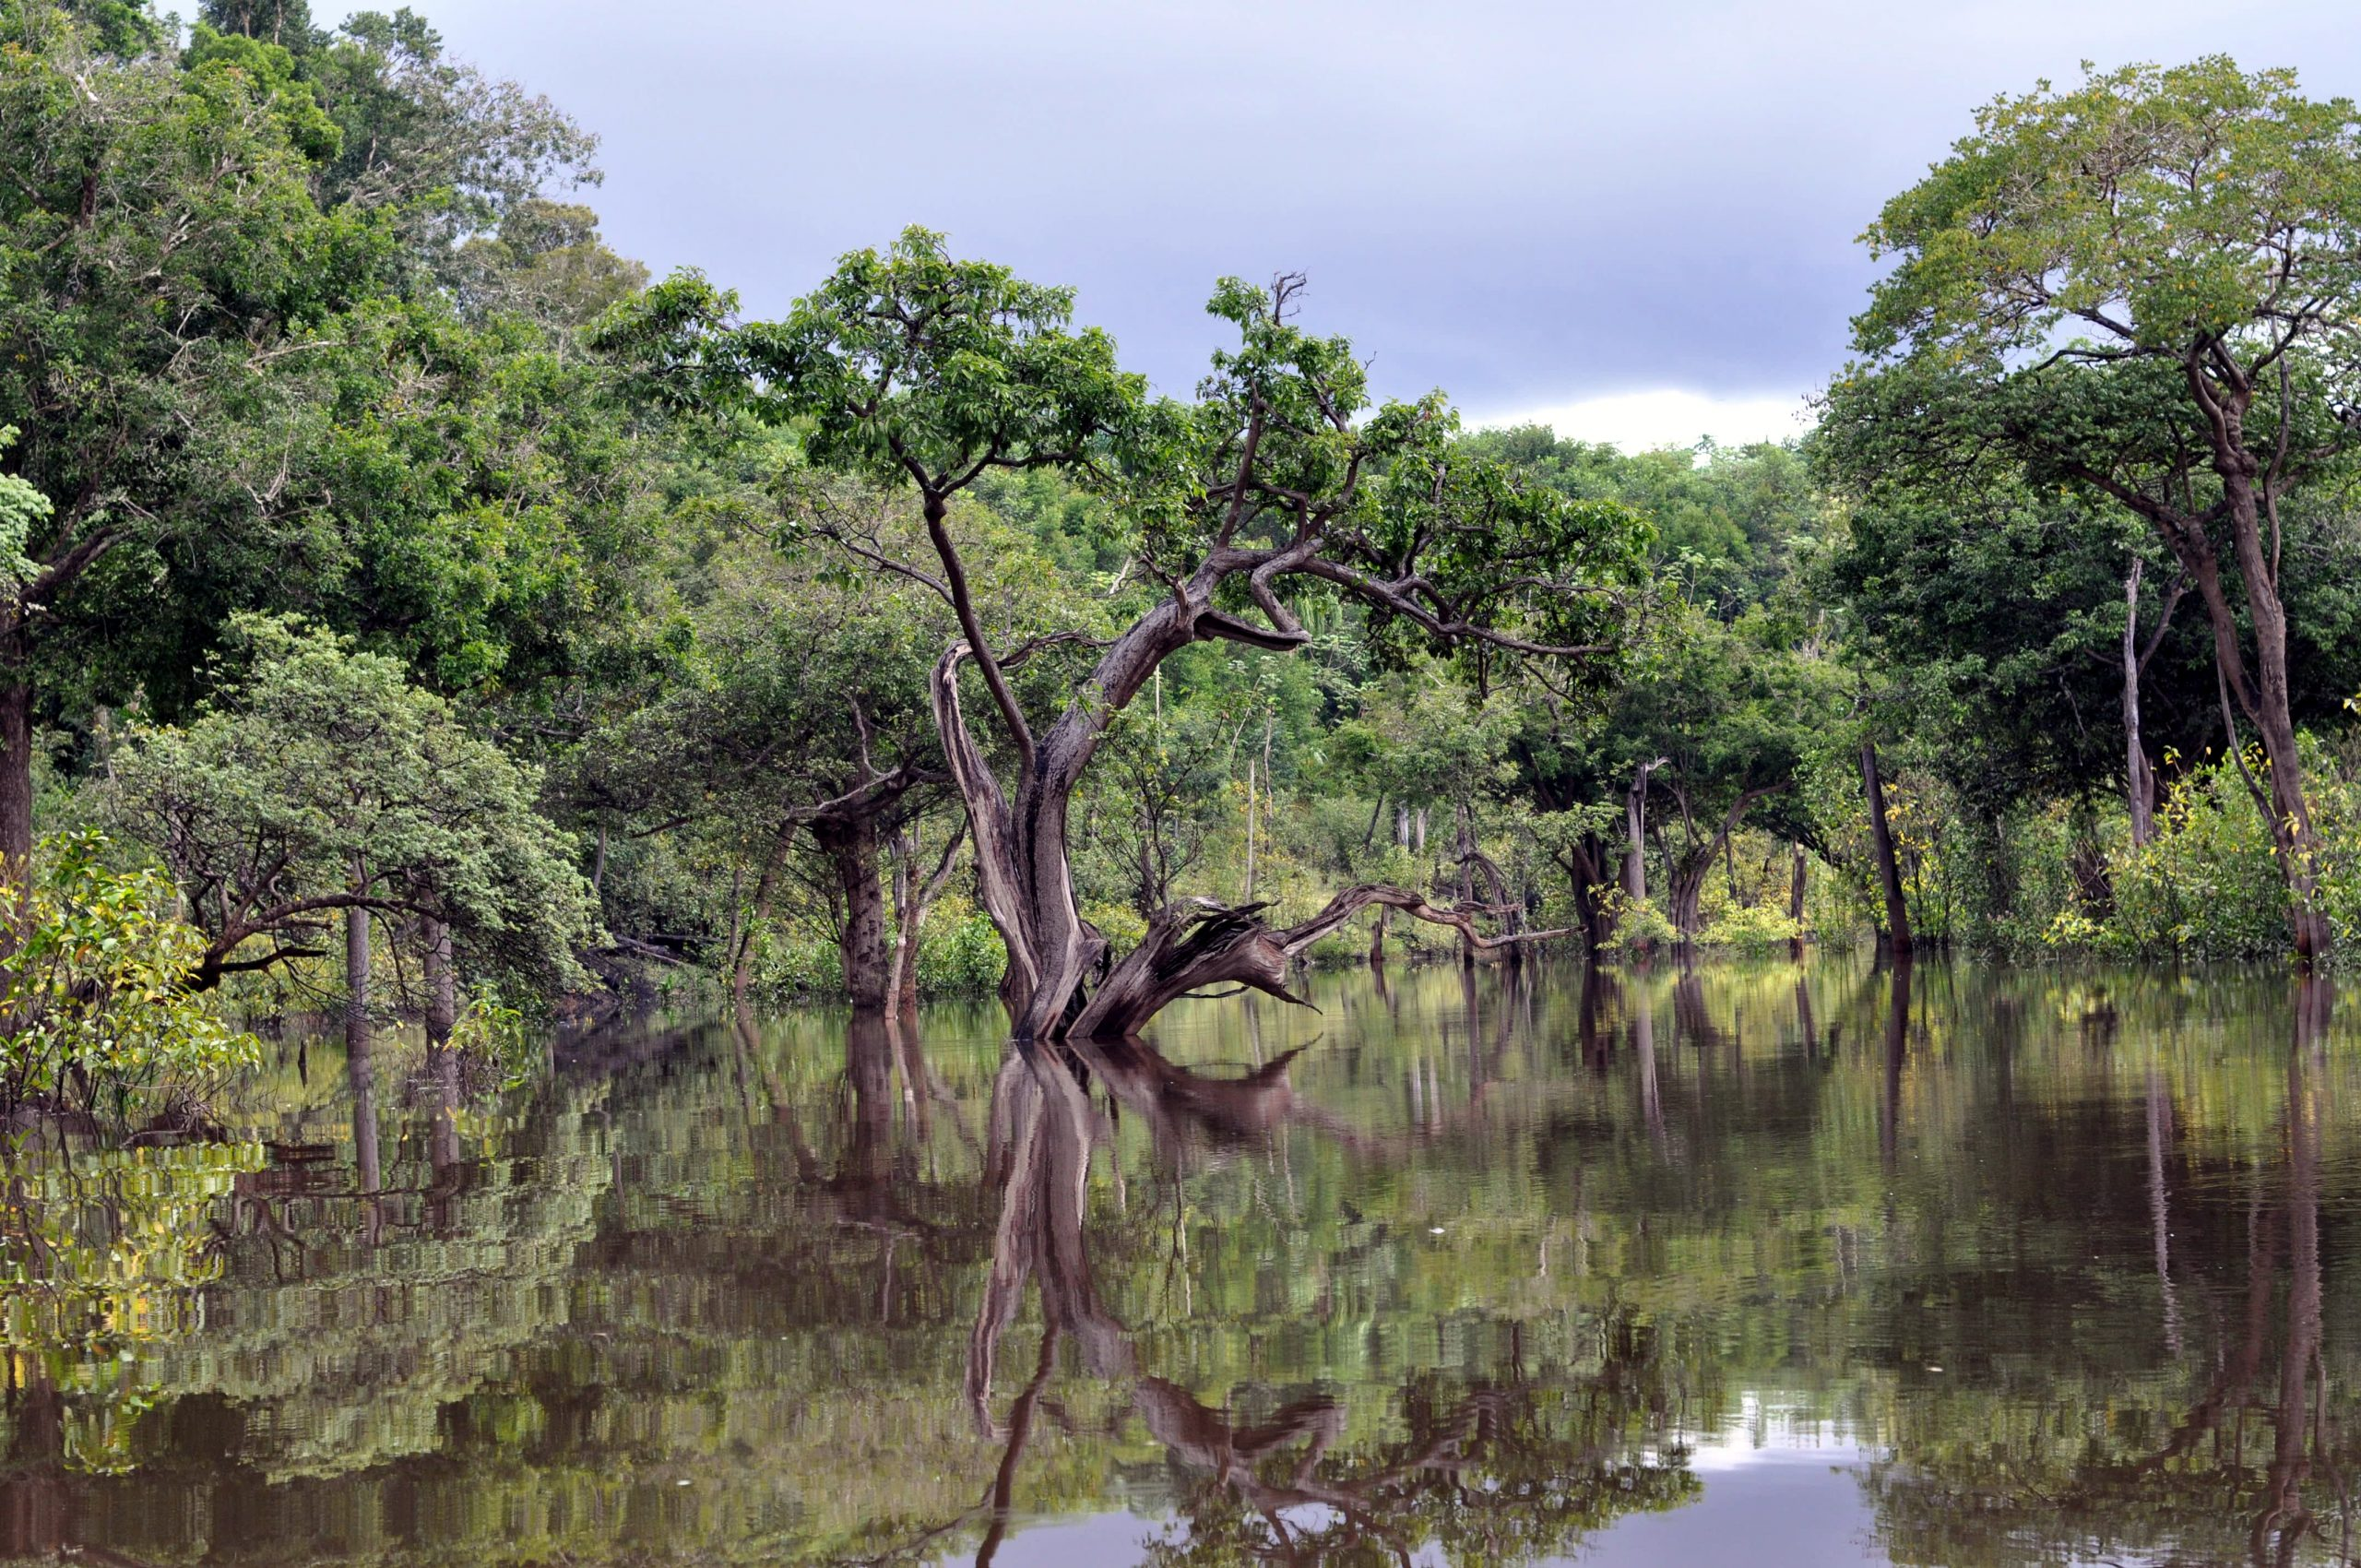 Brasilian sademetsää